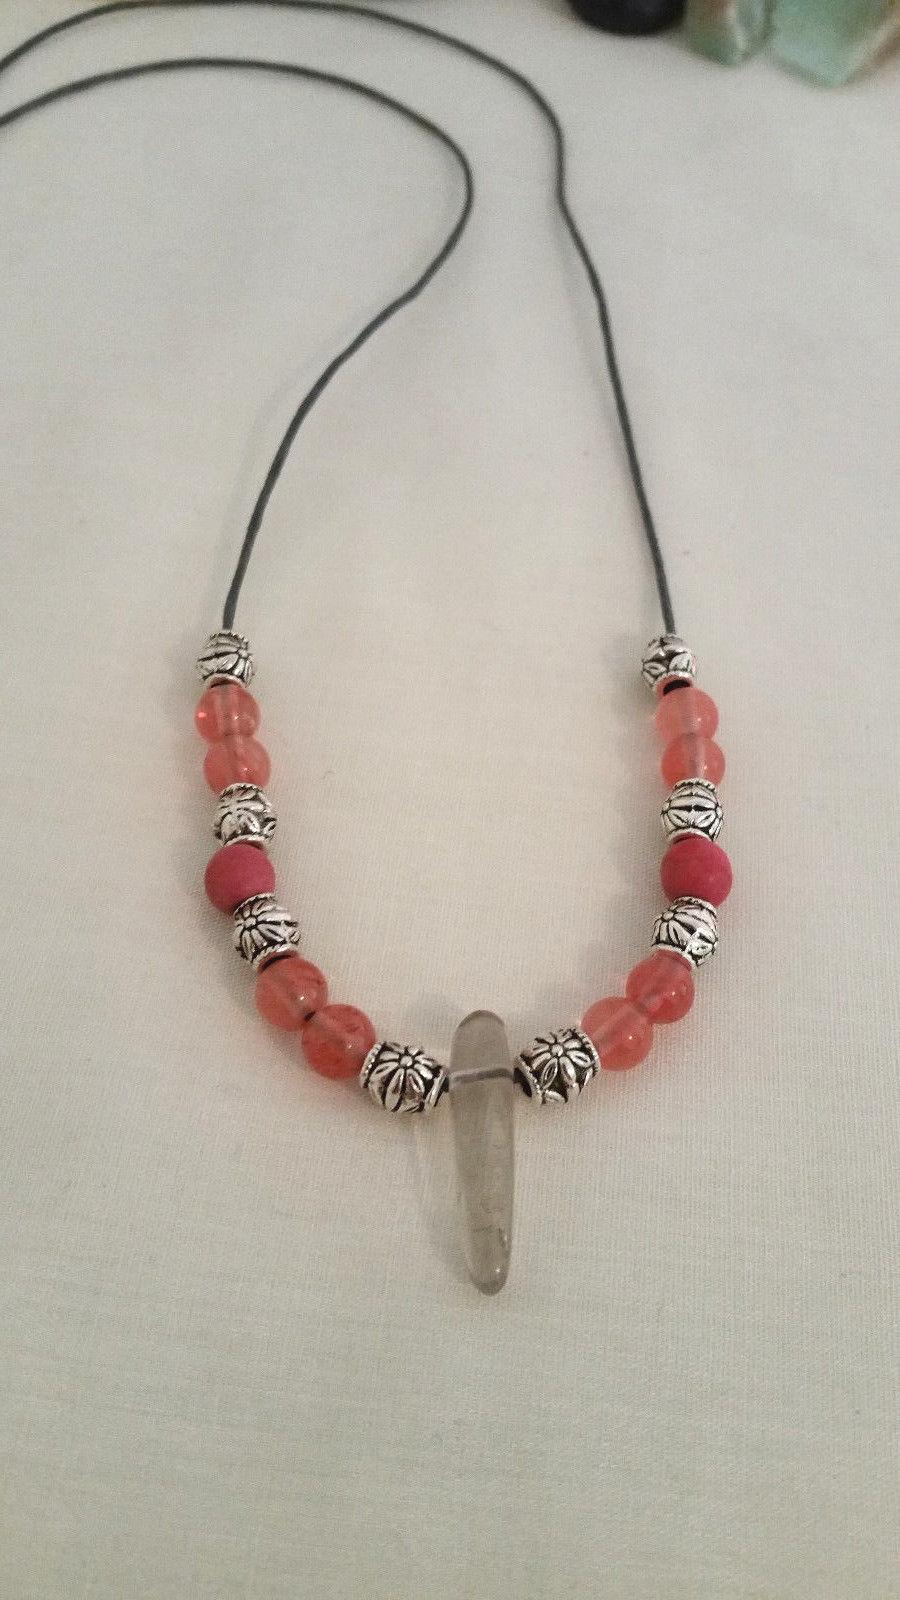 Natural Cherry Quartz Necklace with Smoky Quartz Point Women, Men, Valentines